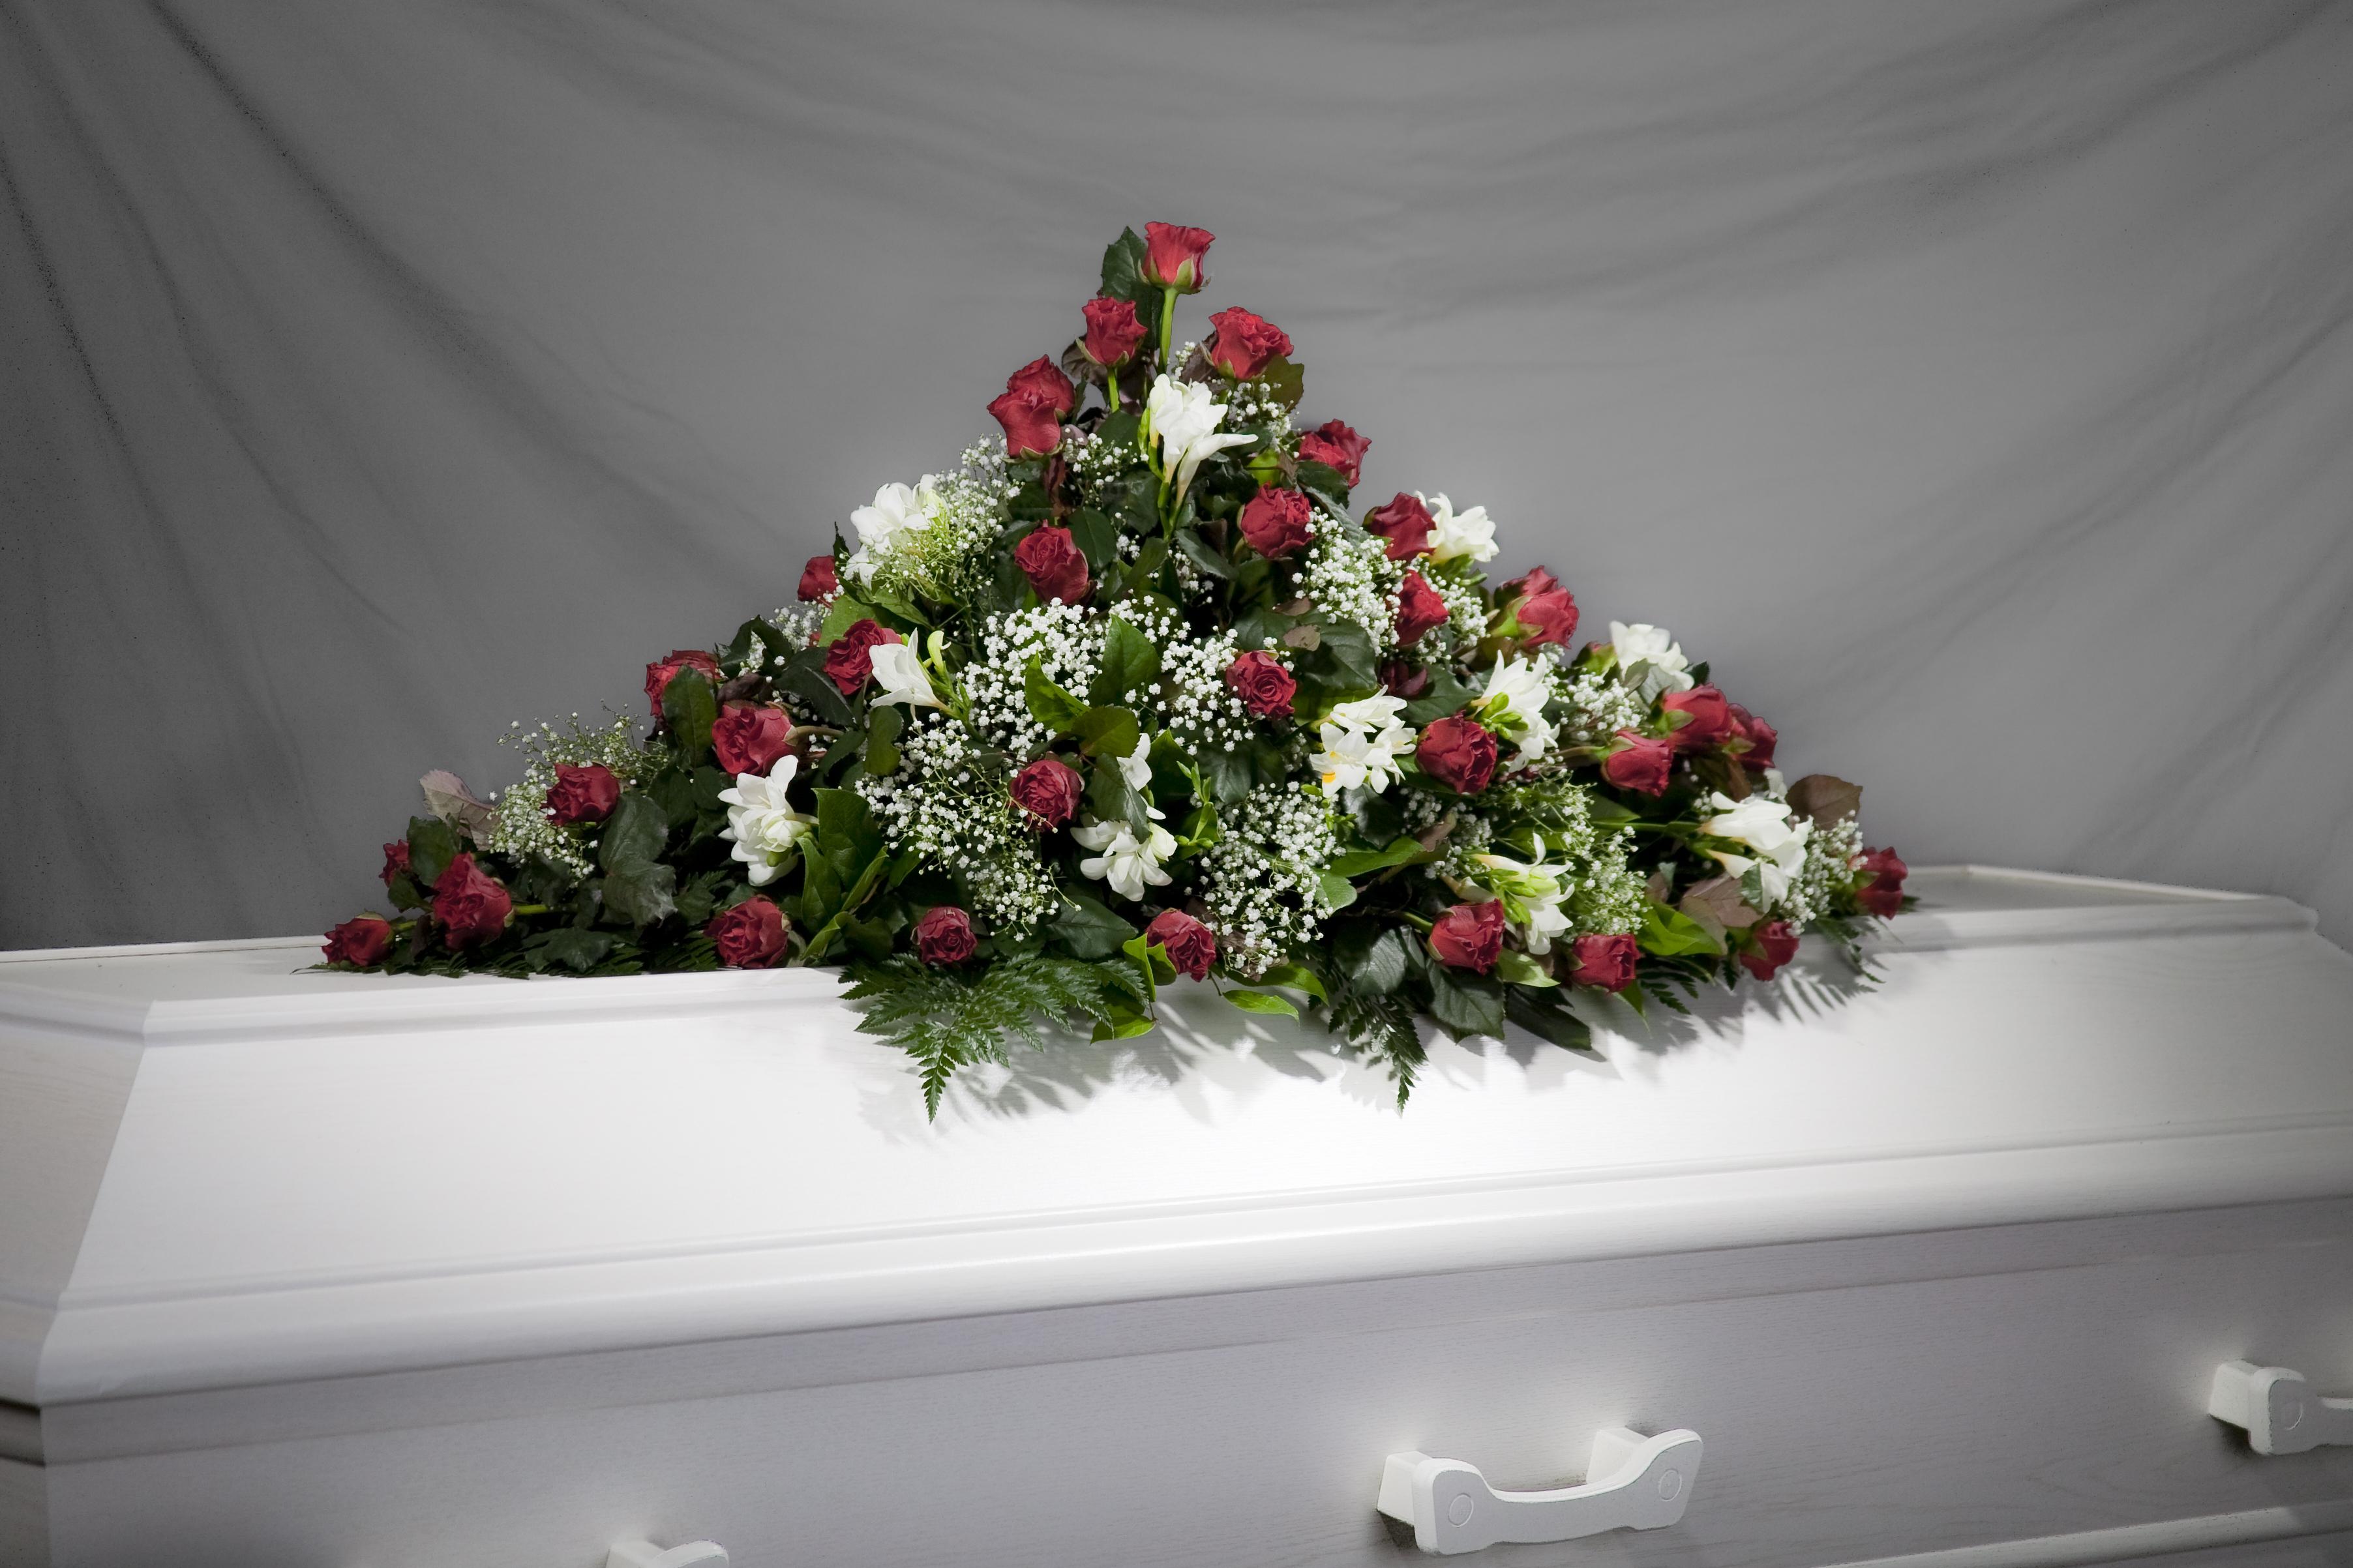 sov i ro begravning